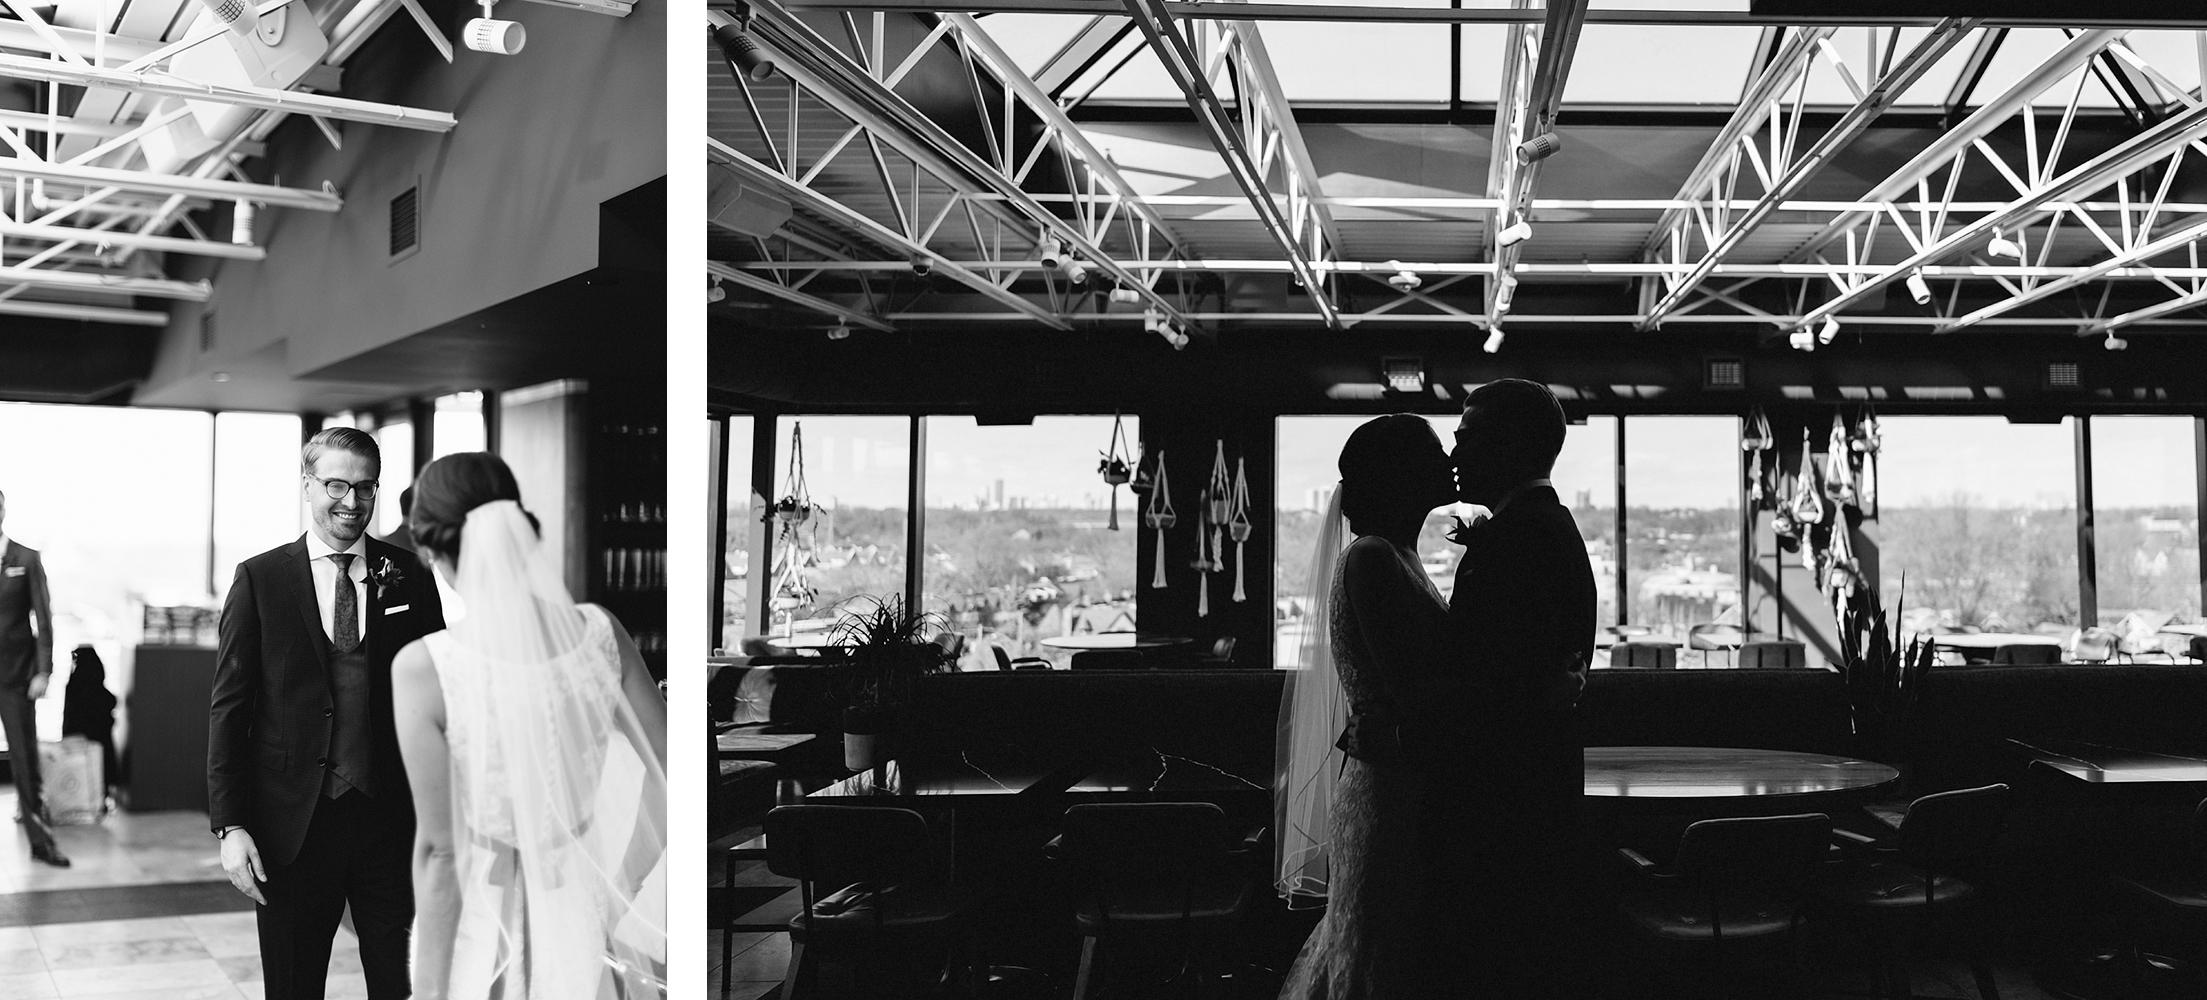 broadview-hotel-REAL-wedding-photos-best-wedding-venues-toronto-analog-film-wedding-photography-boutique-hotel-21.jpg